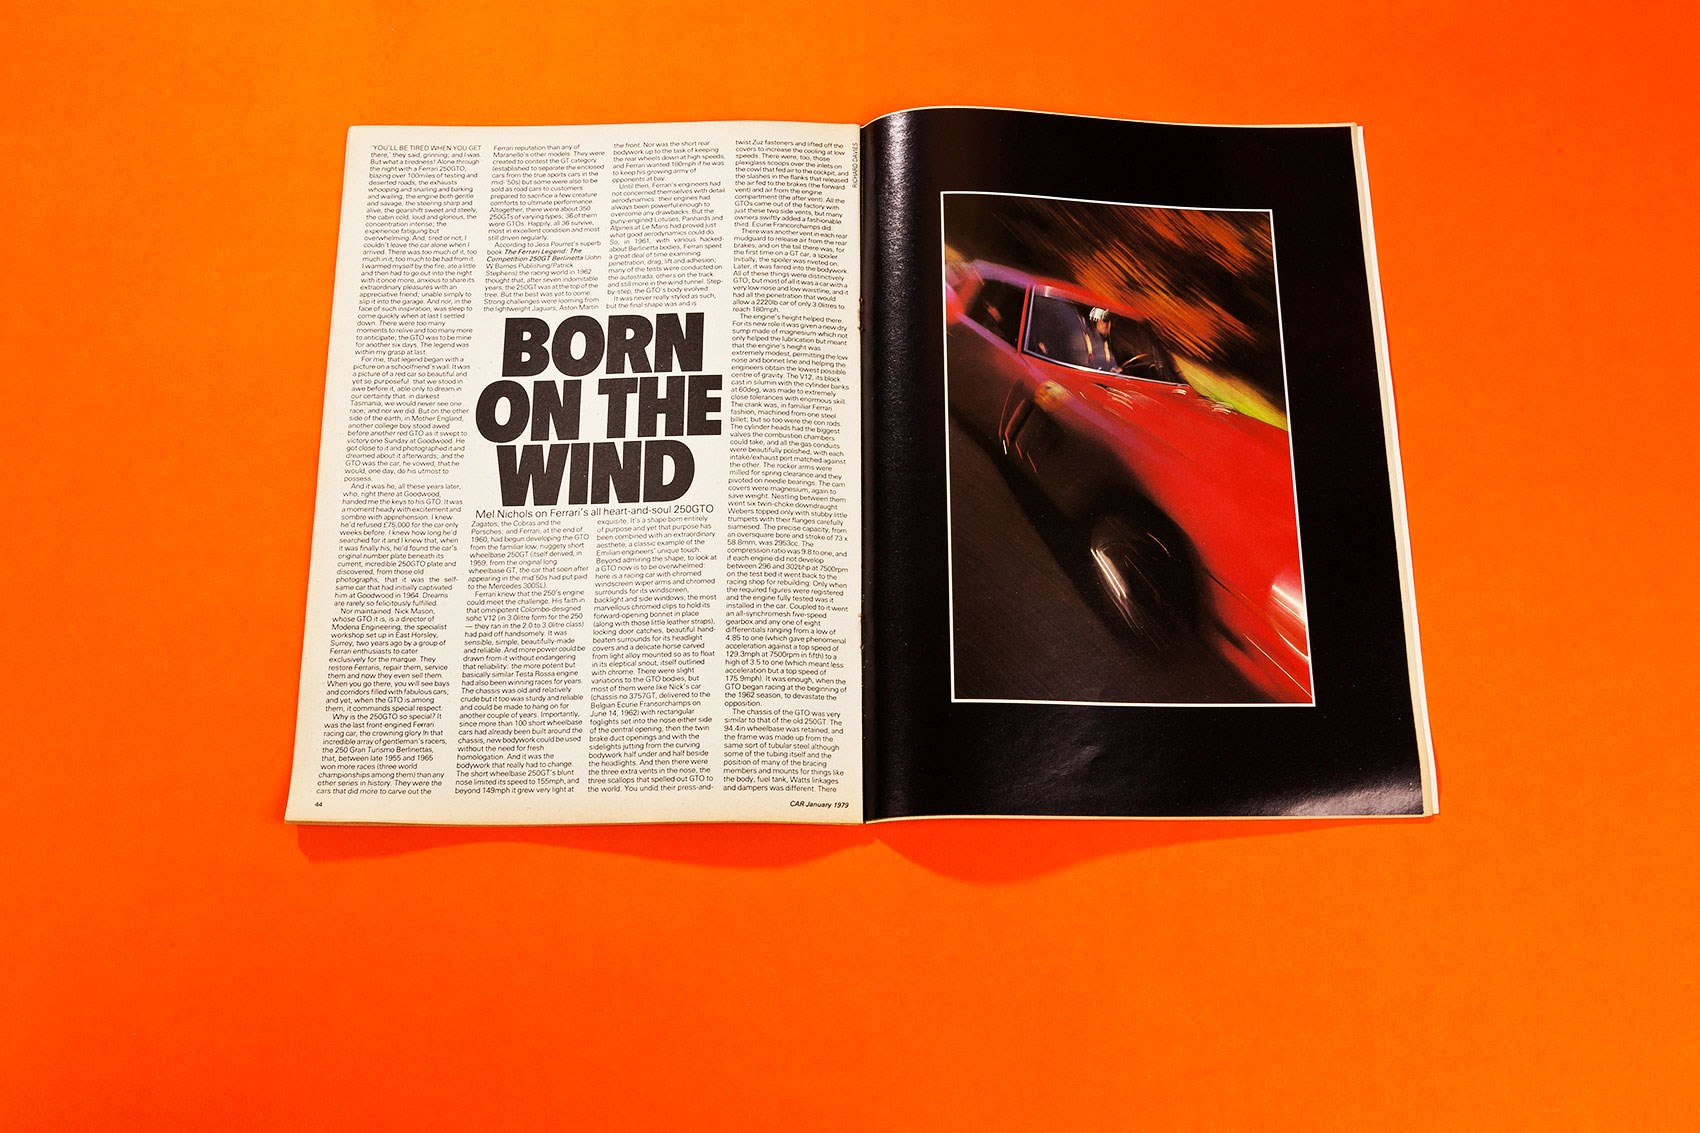 Subaru Wrx Sti 2016 Long Term Test Review Car Magazine 1964 Gto Wiring Harness Radio Born In The Wind January 1979 Mel Nichols Drives Ferrari 250gto